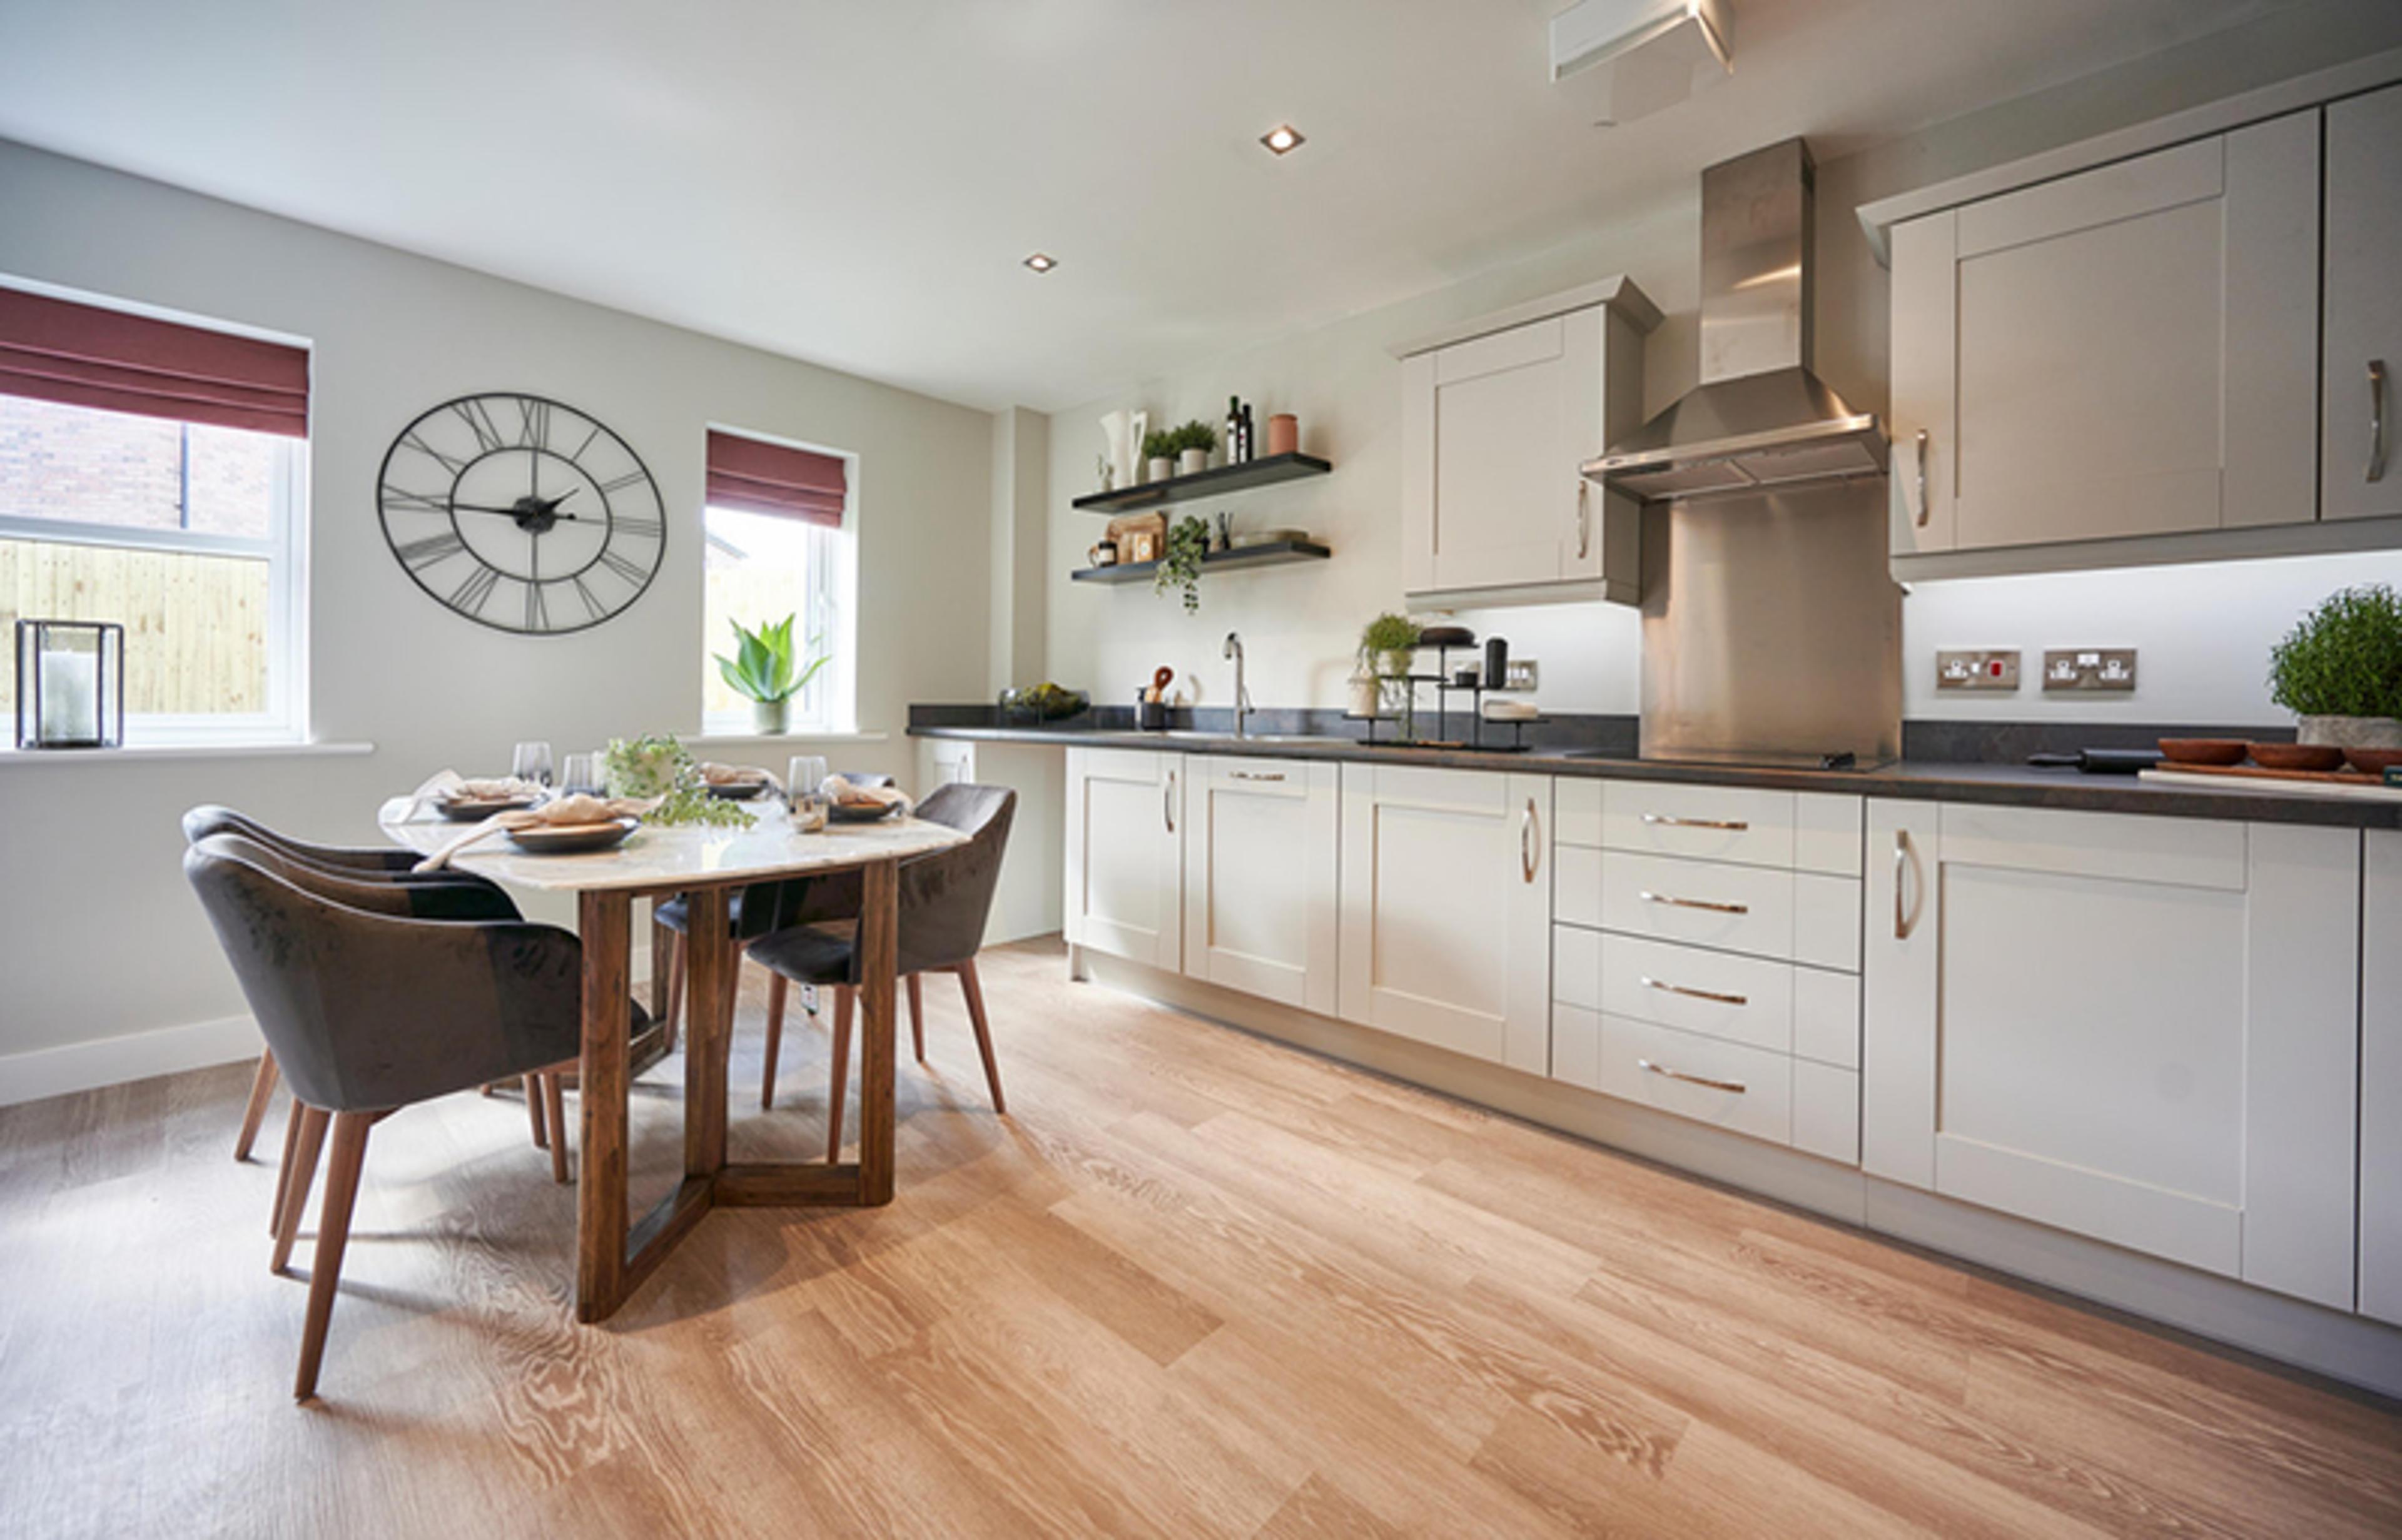 woolner-brook-wigton-sovereign-3-bed-home-kitchen-dining-room-3